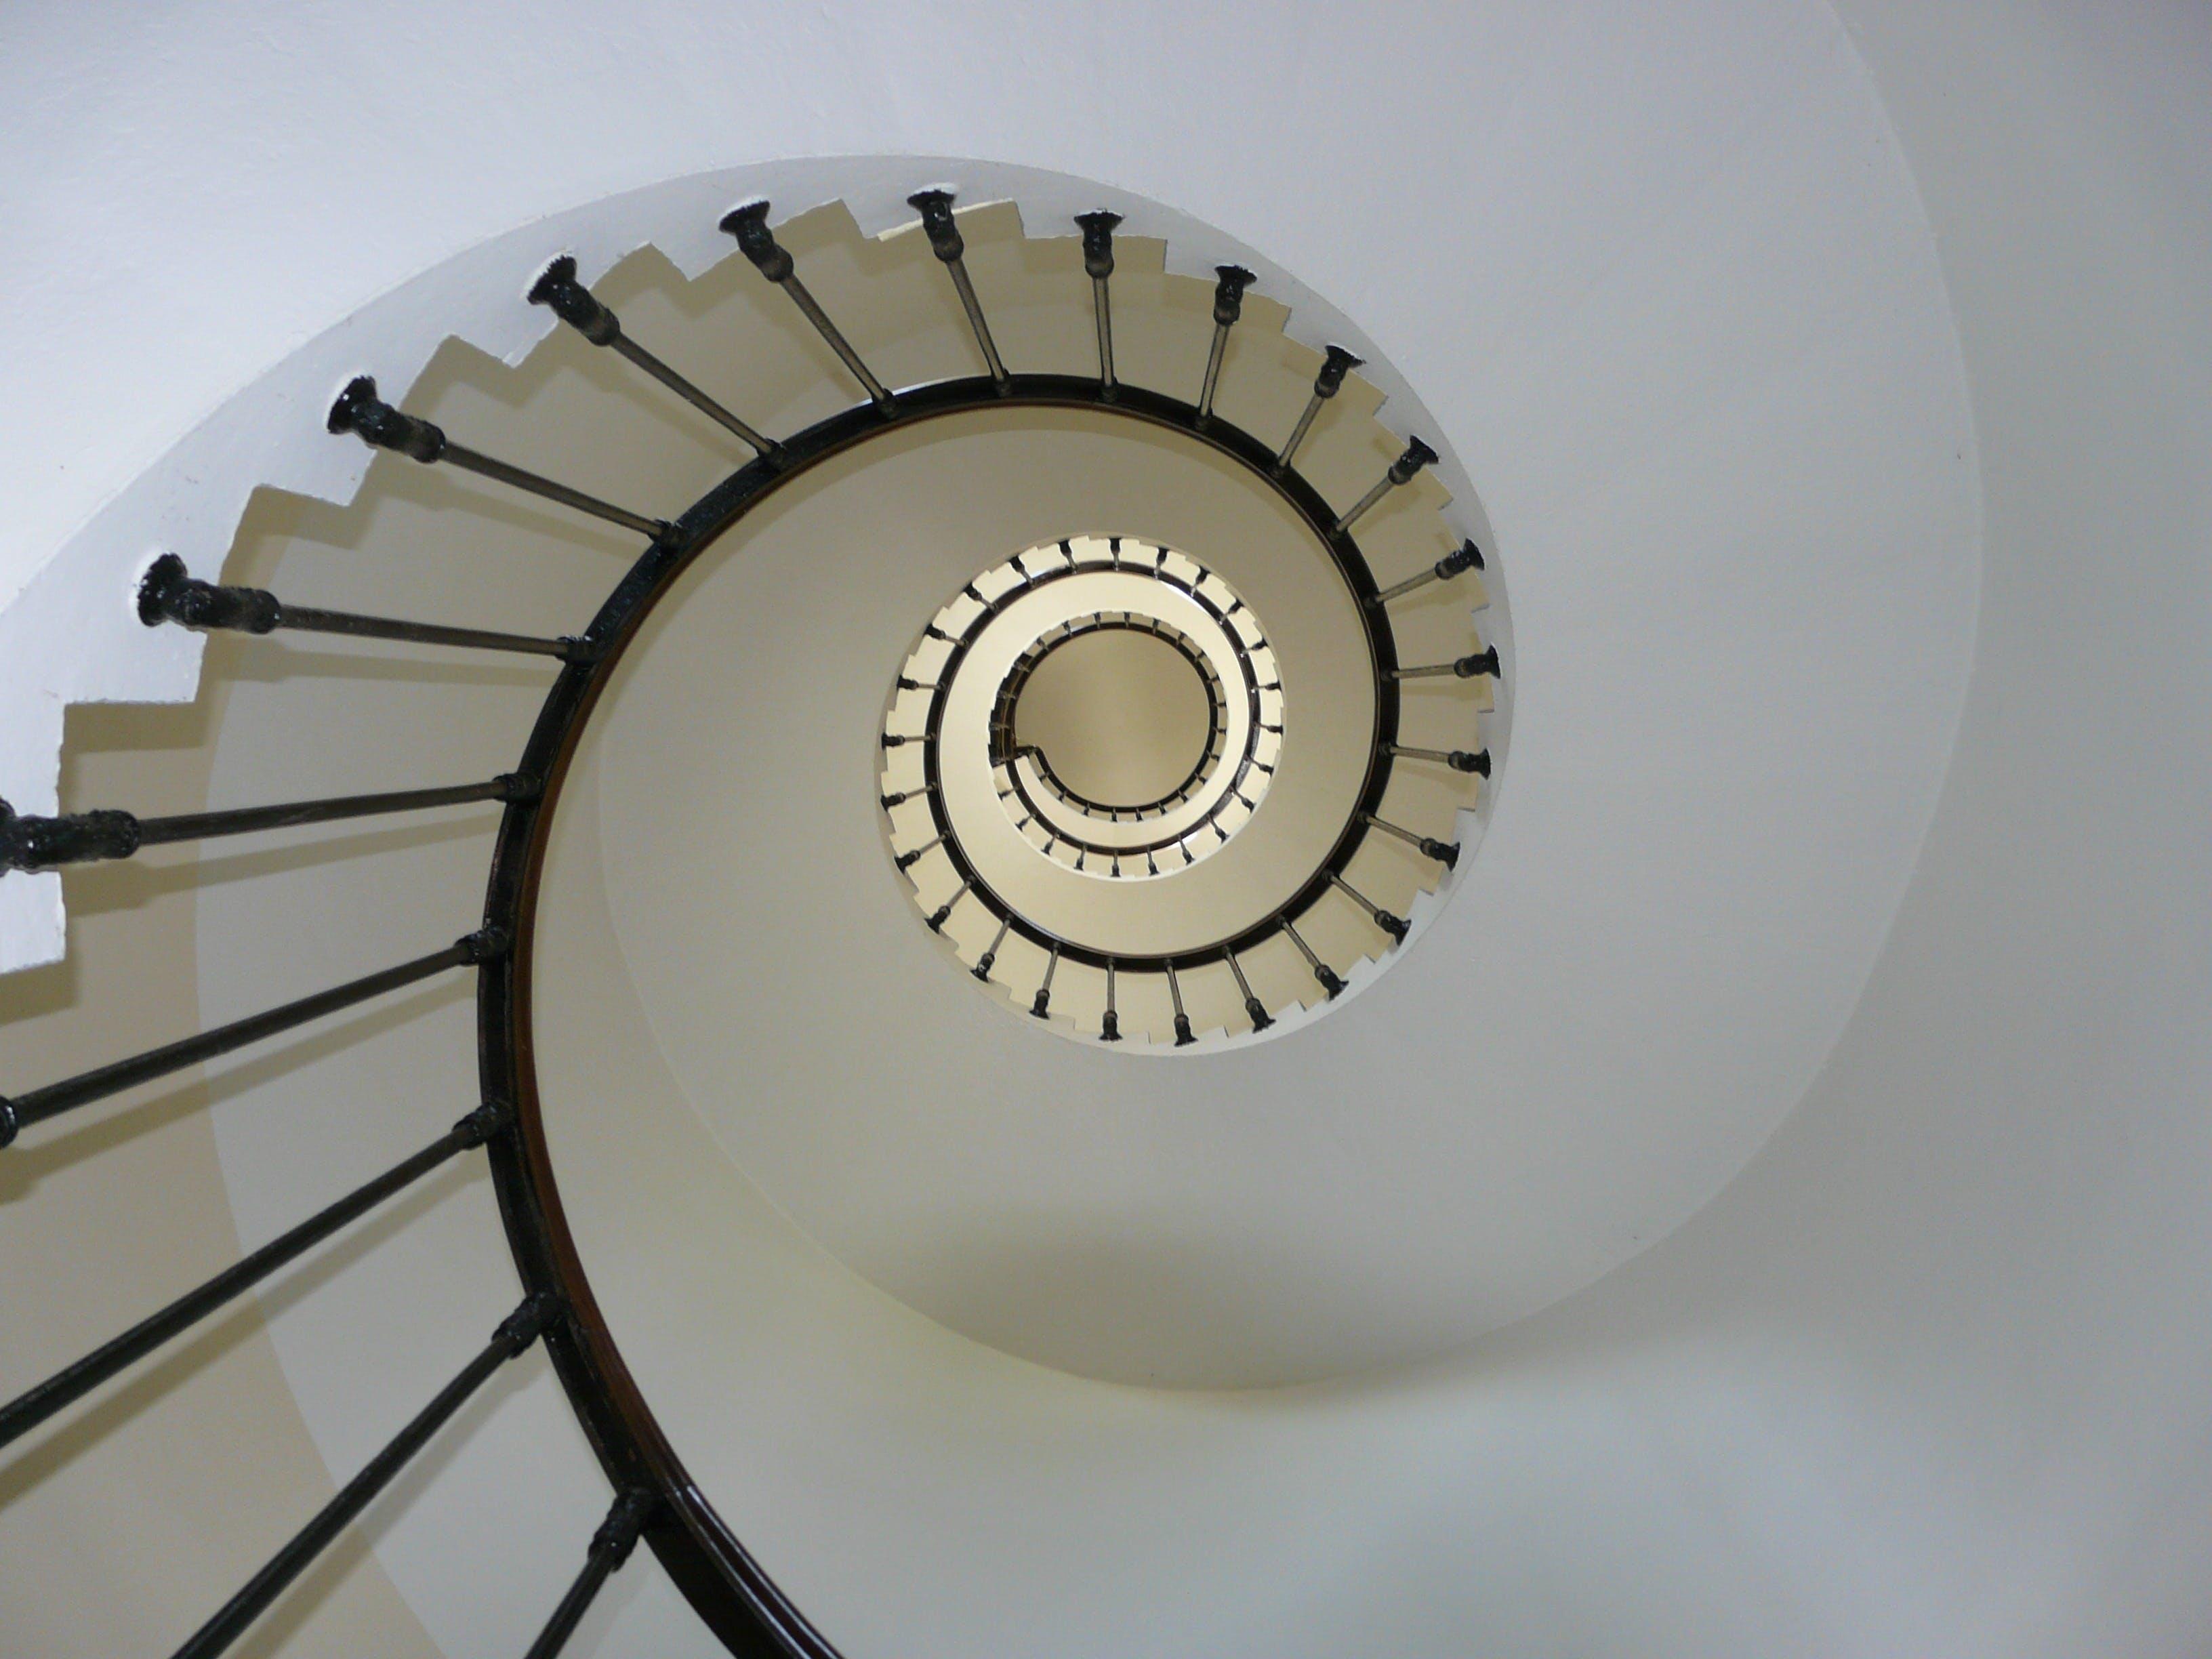 döner merdiven, merdivenler içeren Ücretsiz stok fotoğraf